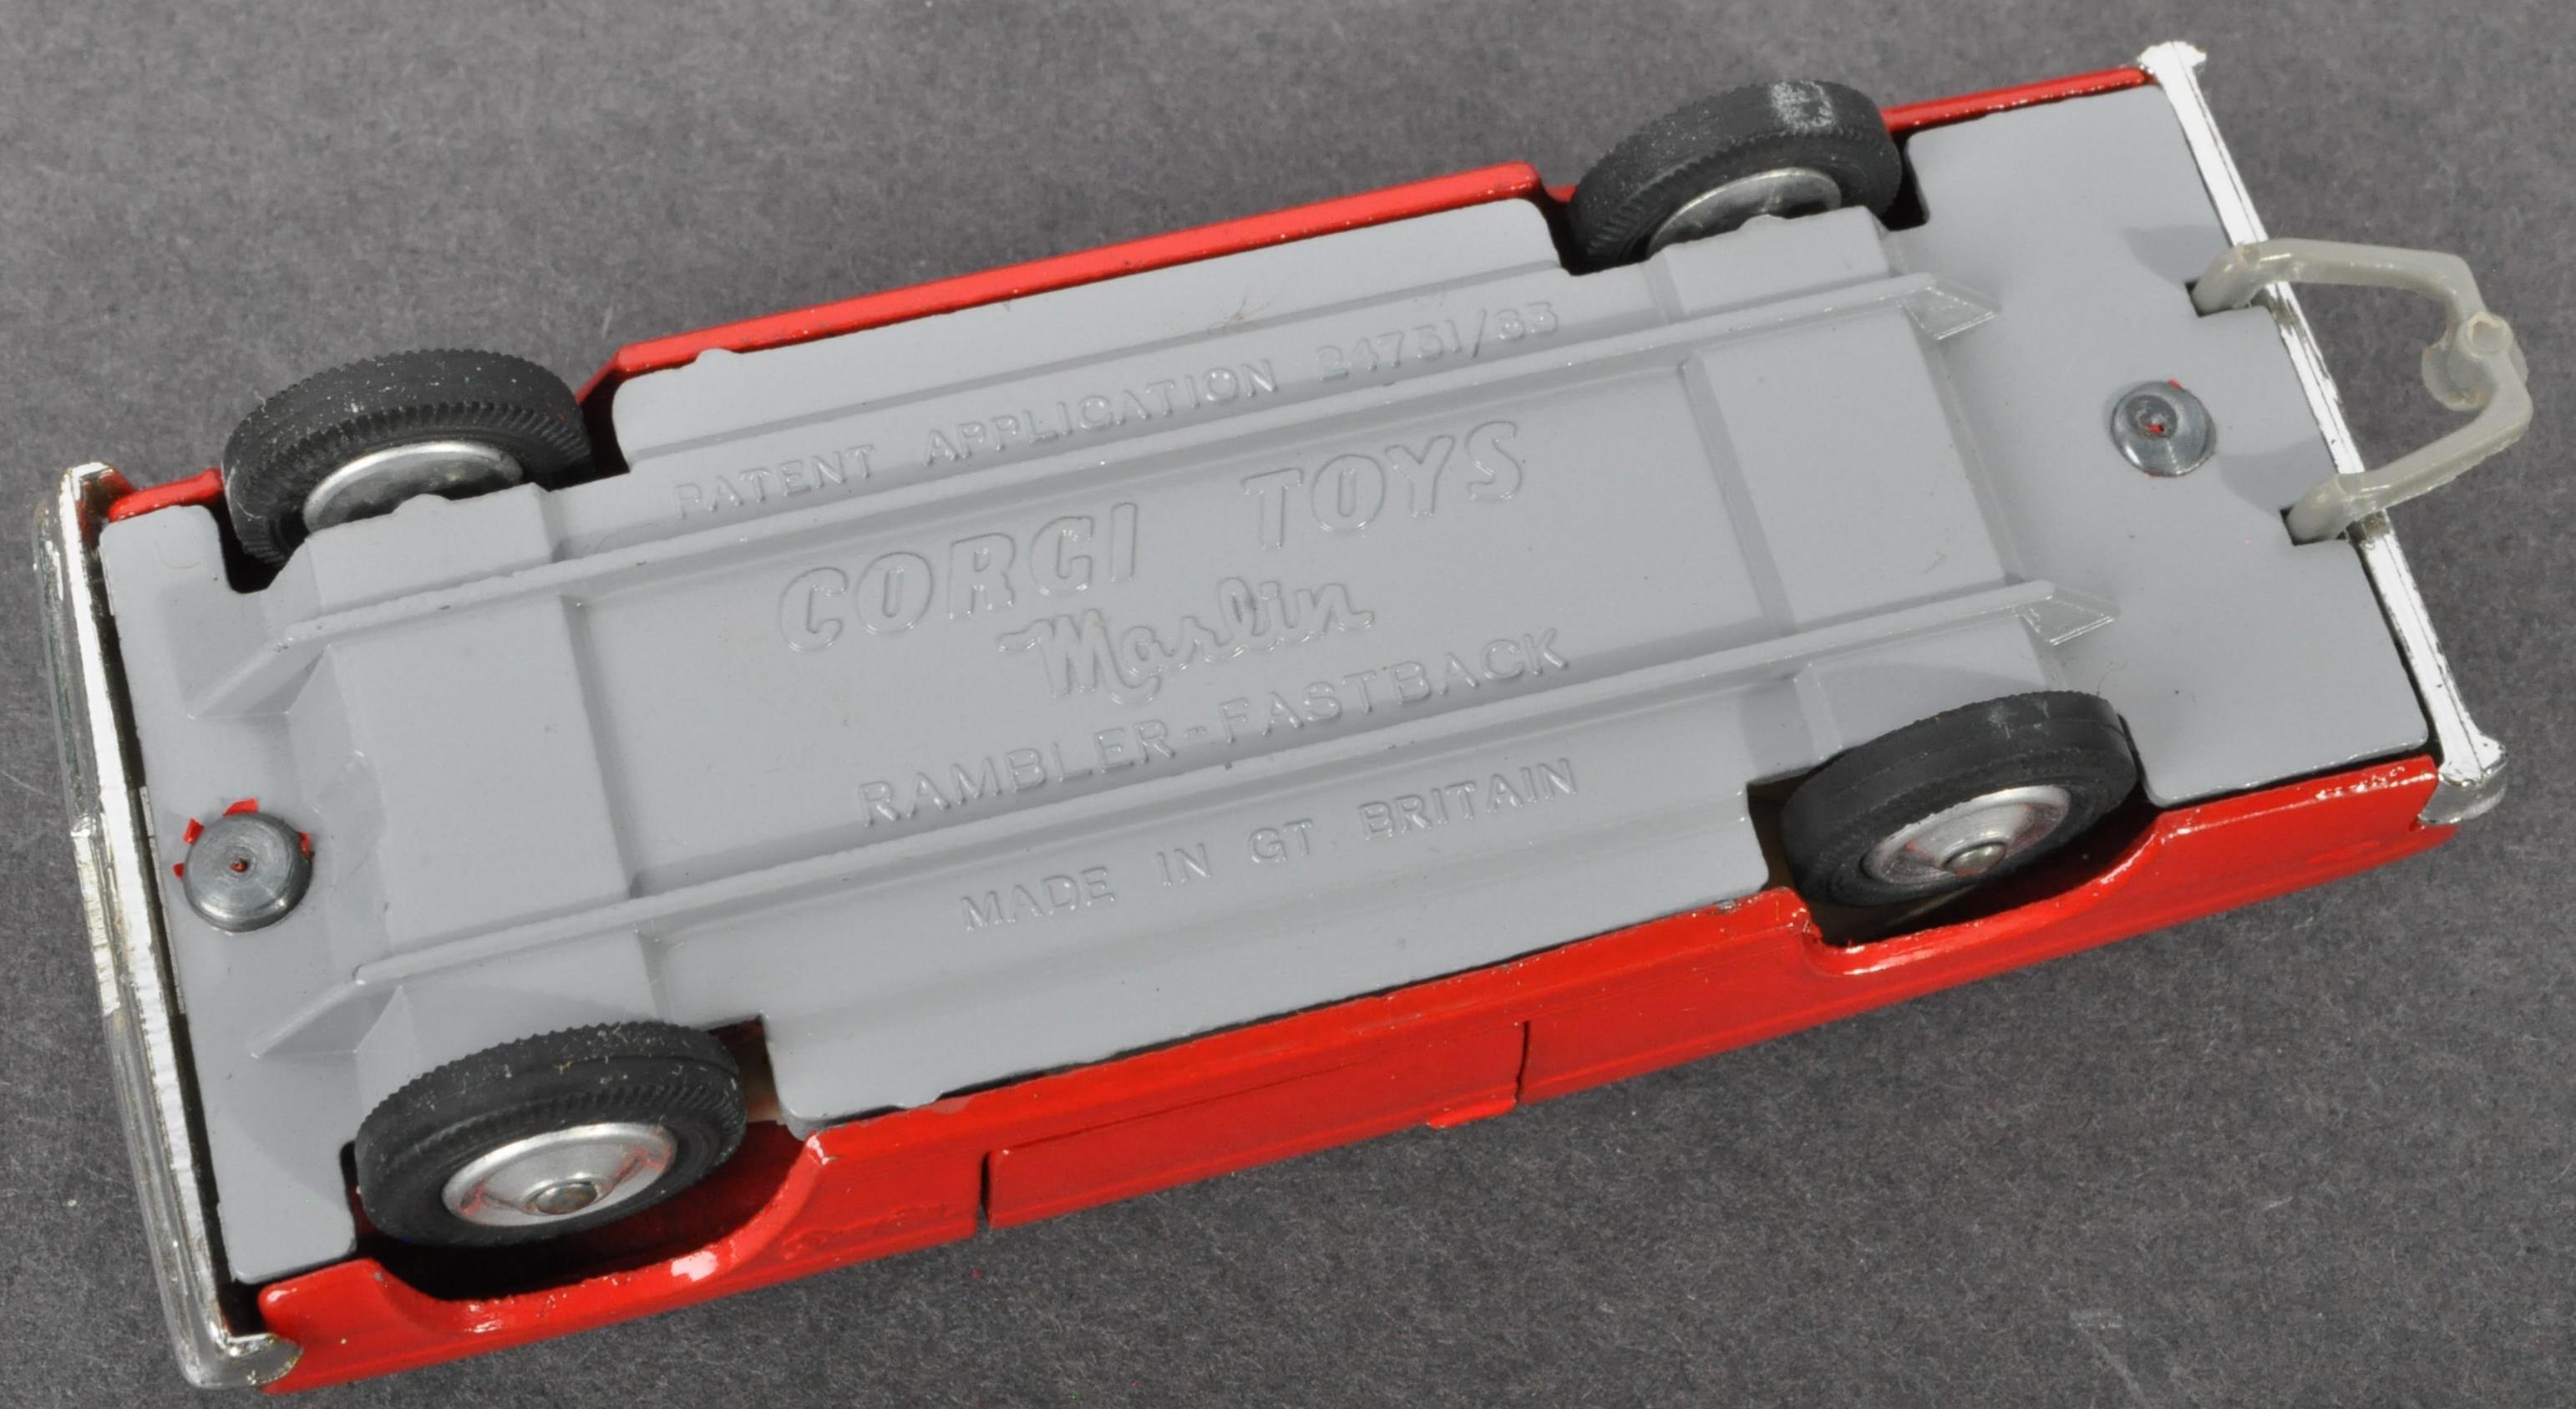 VINTAGE CORGI TOYS BOXED DIECAST MODEL MARLIN 263 - Image 4 of 4